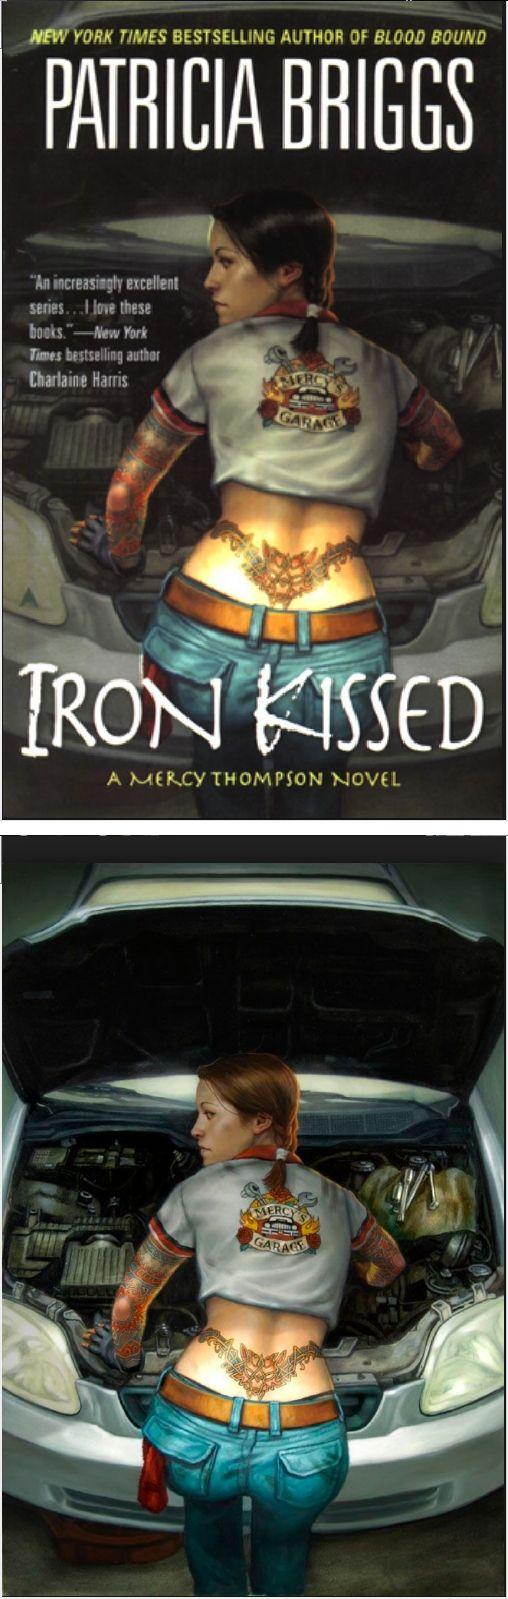 Daniel Dos Santos  Iron Kissed (mercy Thompson 3) By Patricia Briggs  2008